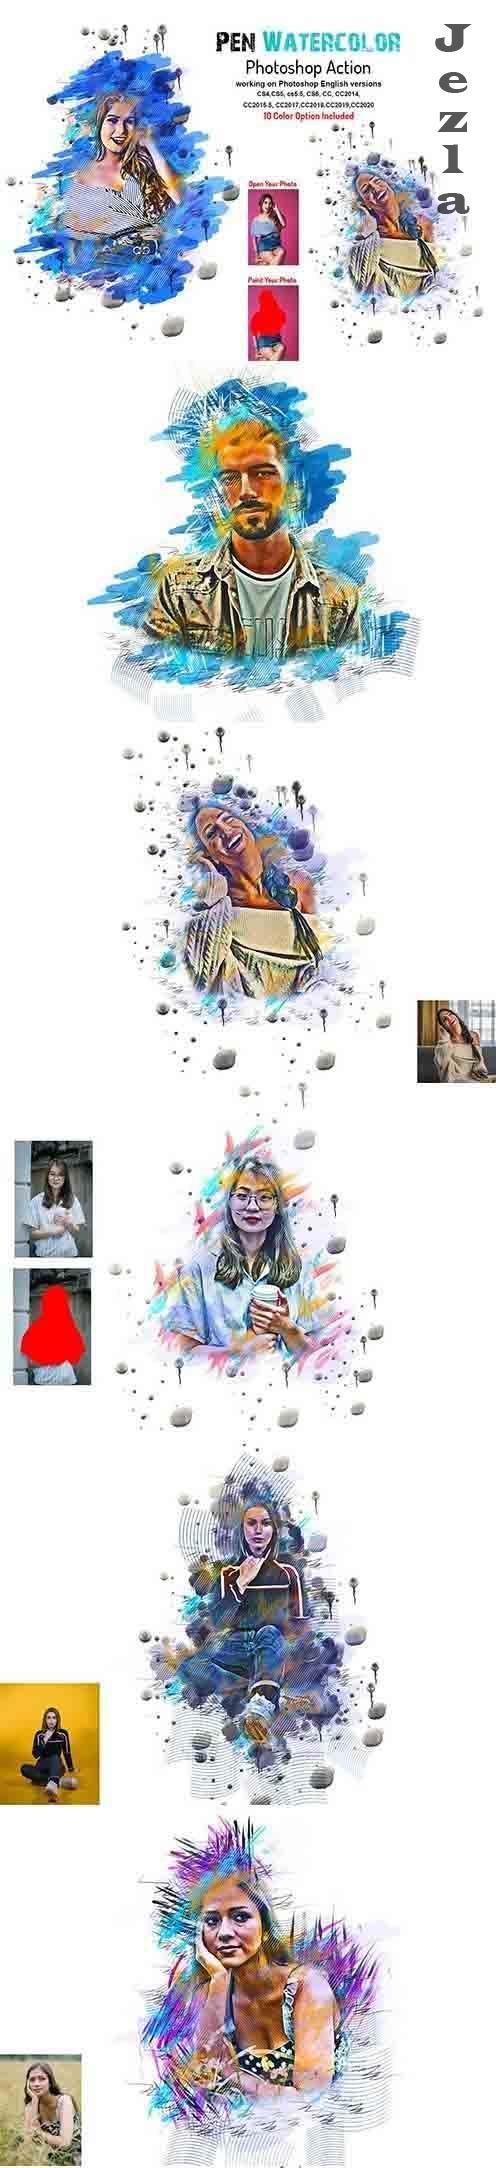 CreativeMarket - Pen Watercolor Photoshop Action 5877779